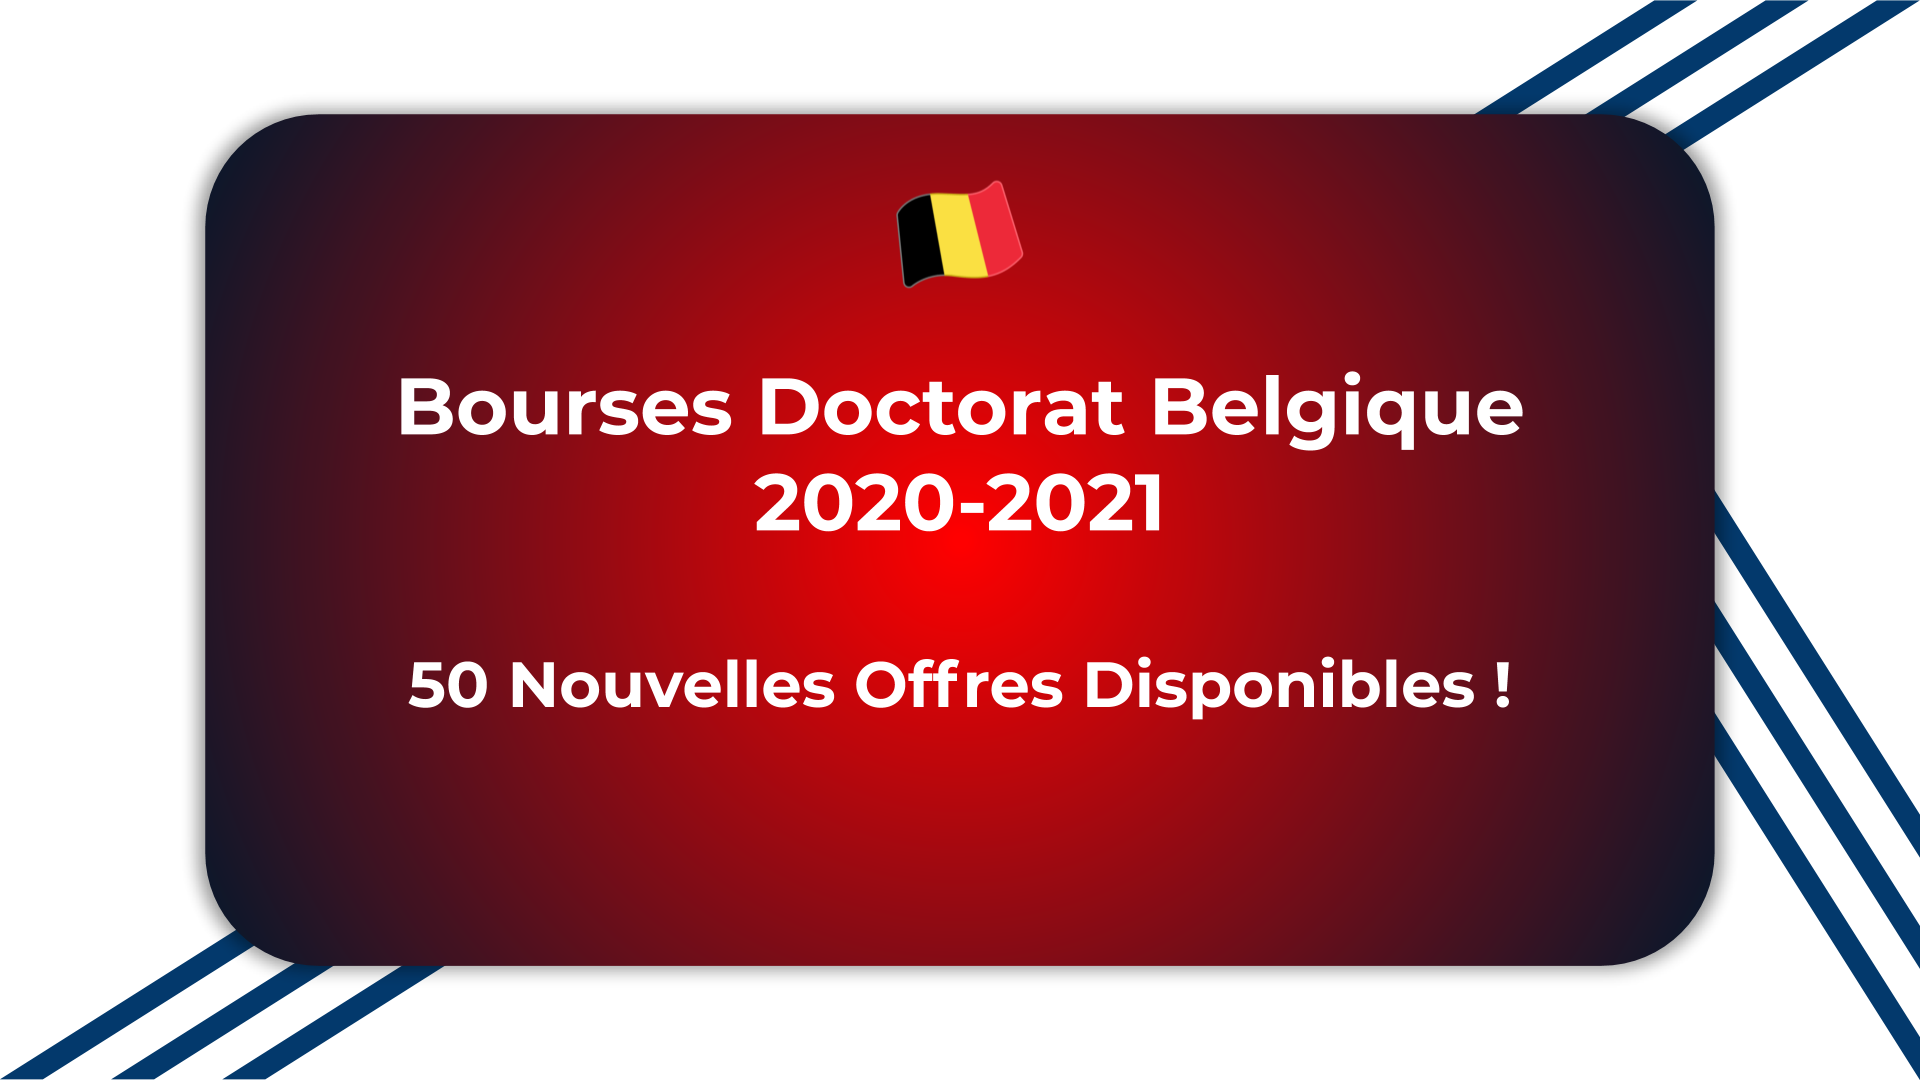 Bourses Doctorat Belgique 2020-2021